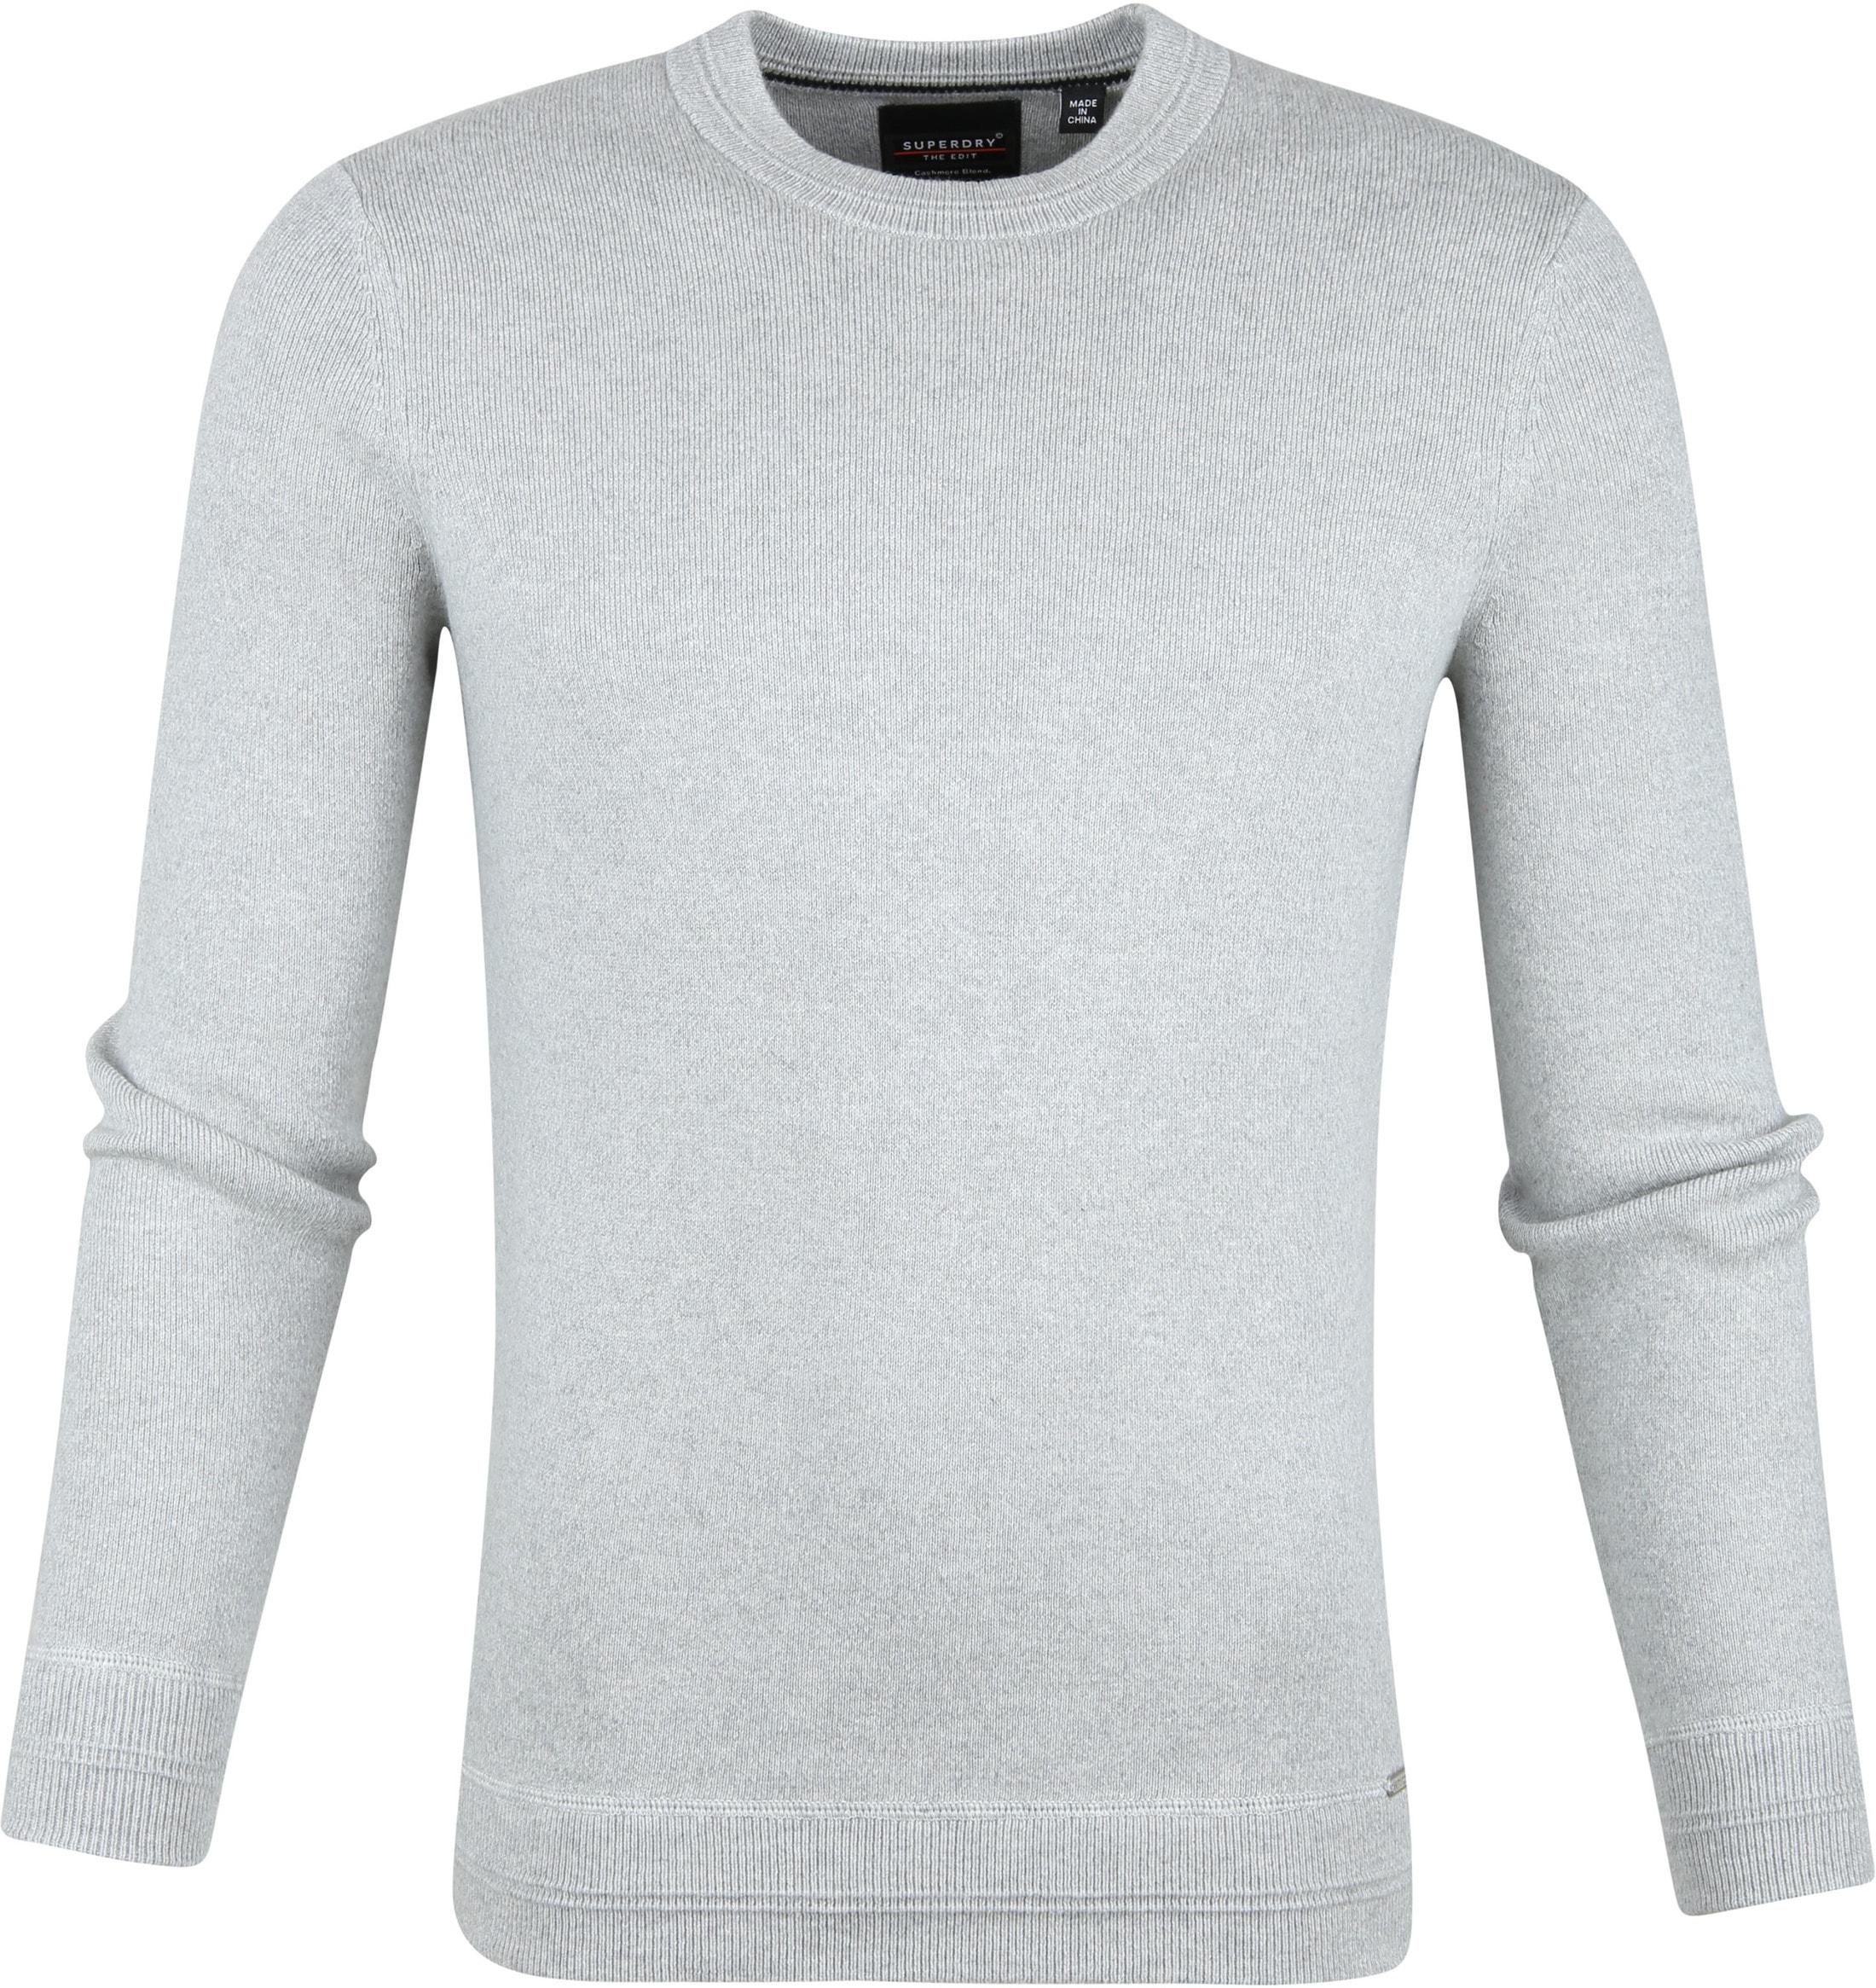 Superdry Pullover Grau Foto 0